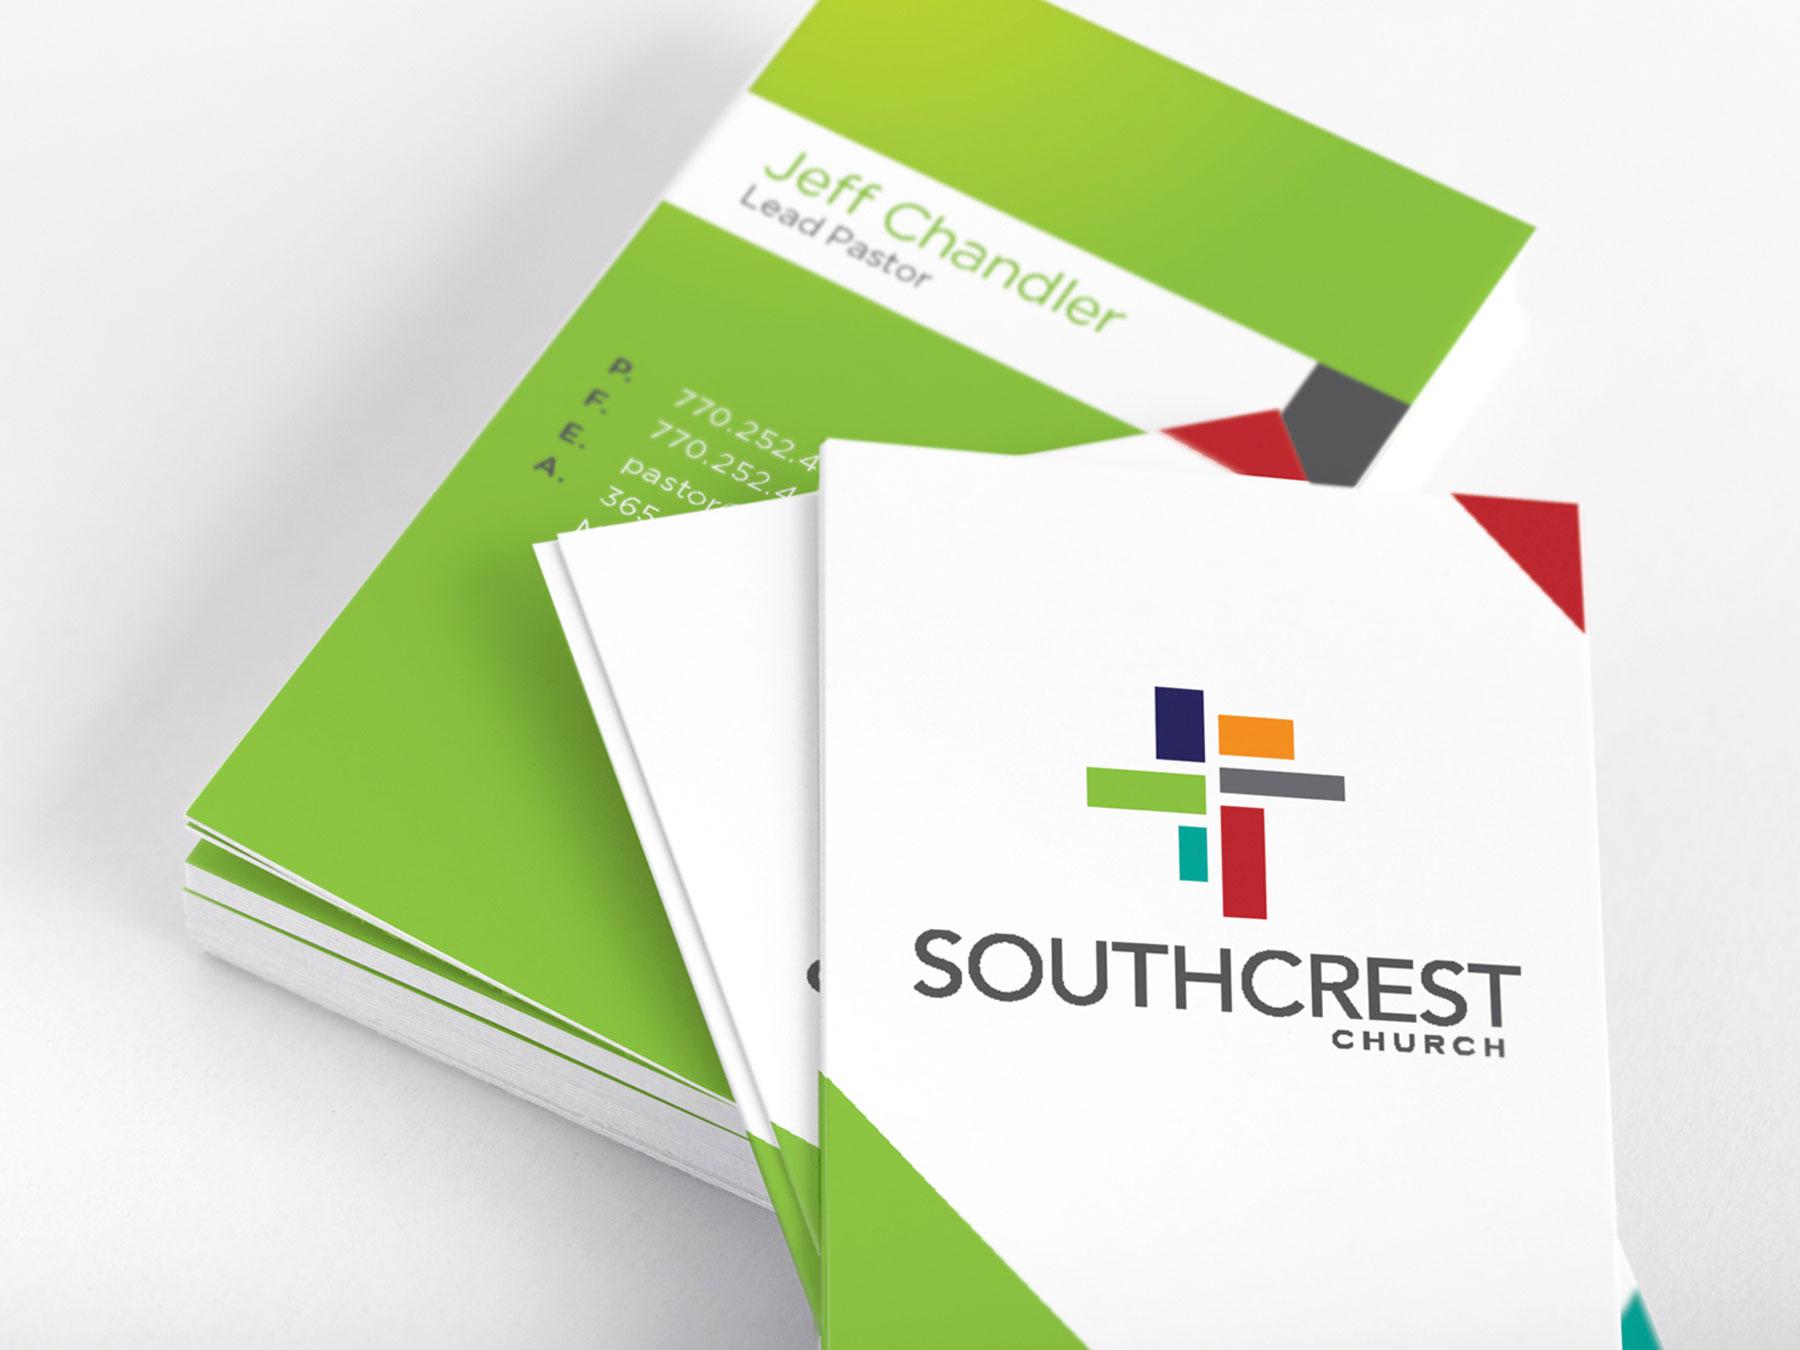 Southcrest Church